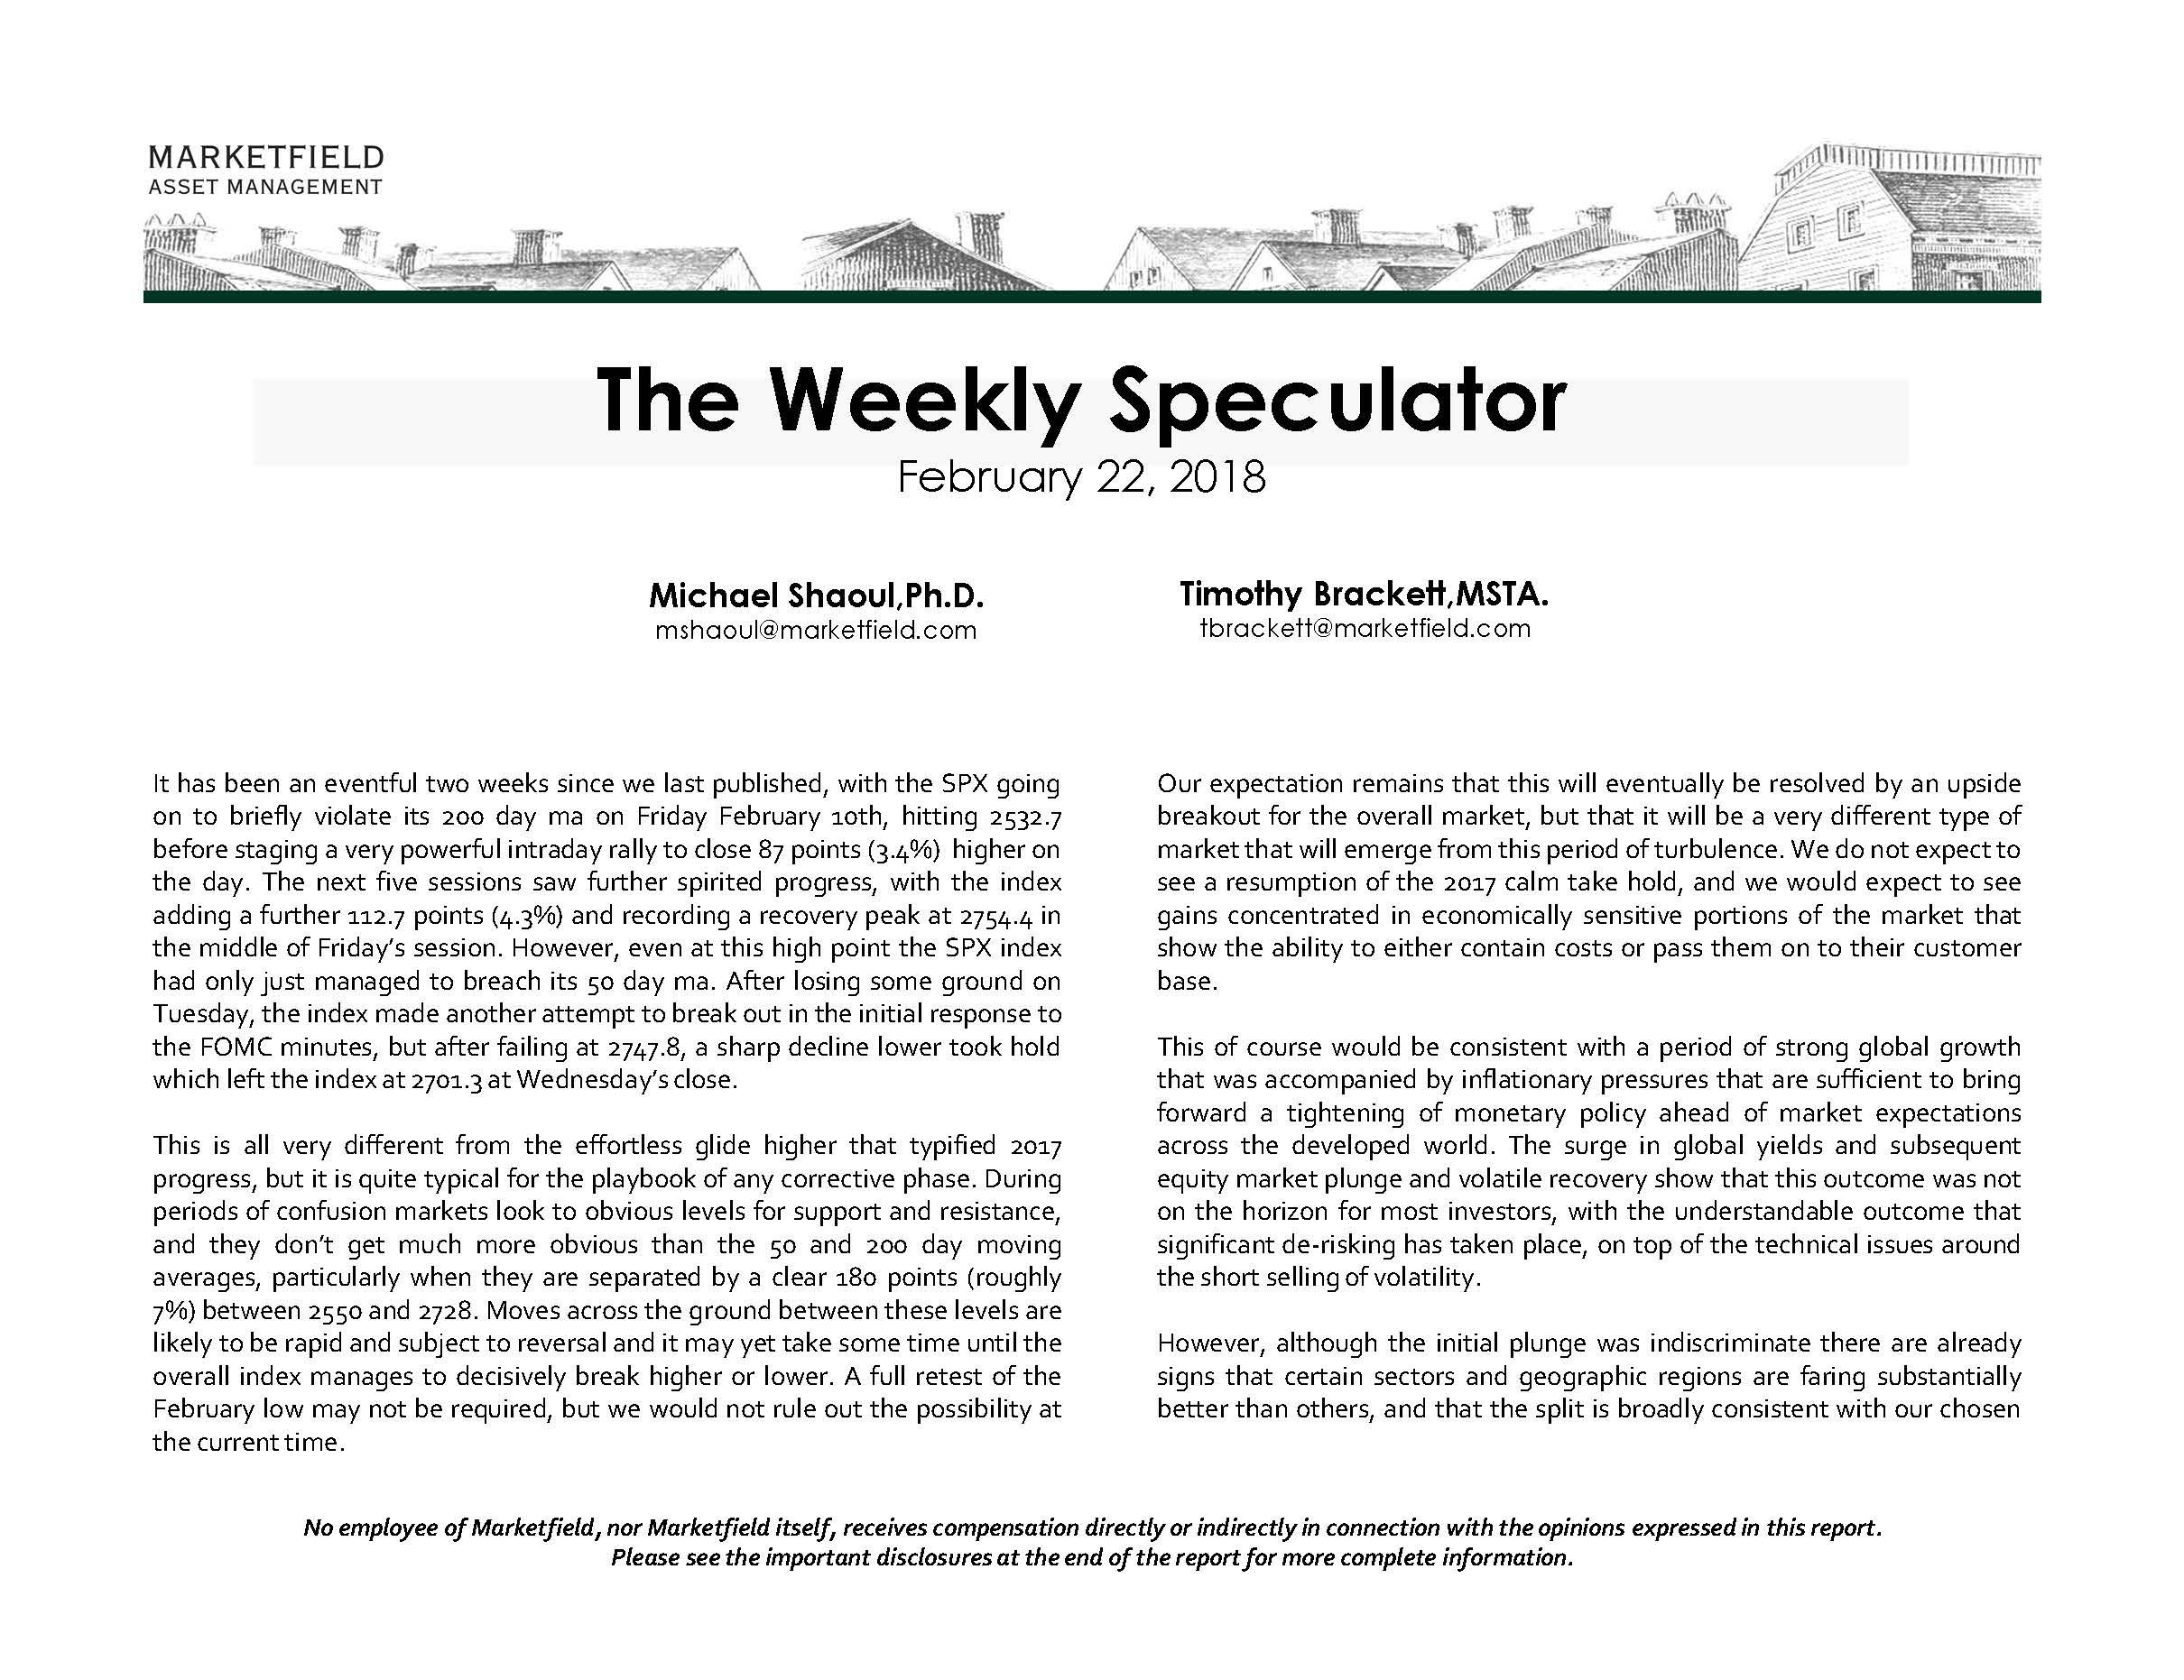 Marketfield Weekly Speculator 02-22-18_Page_01.jpg